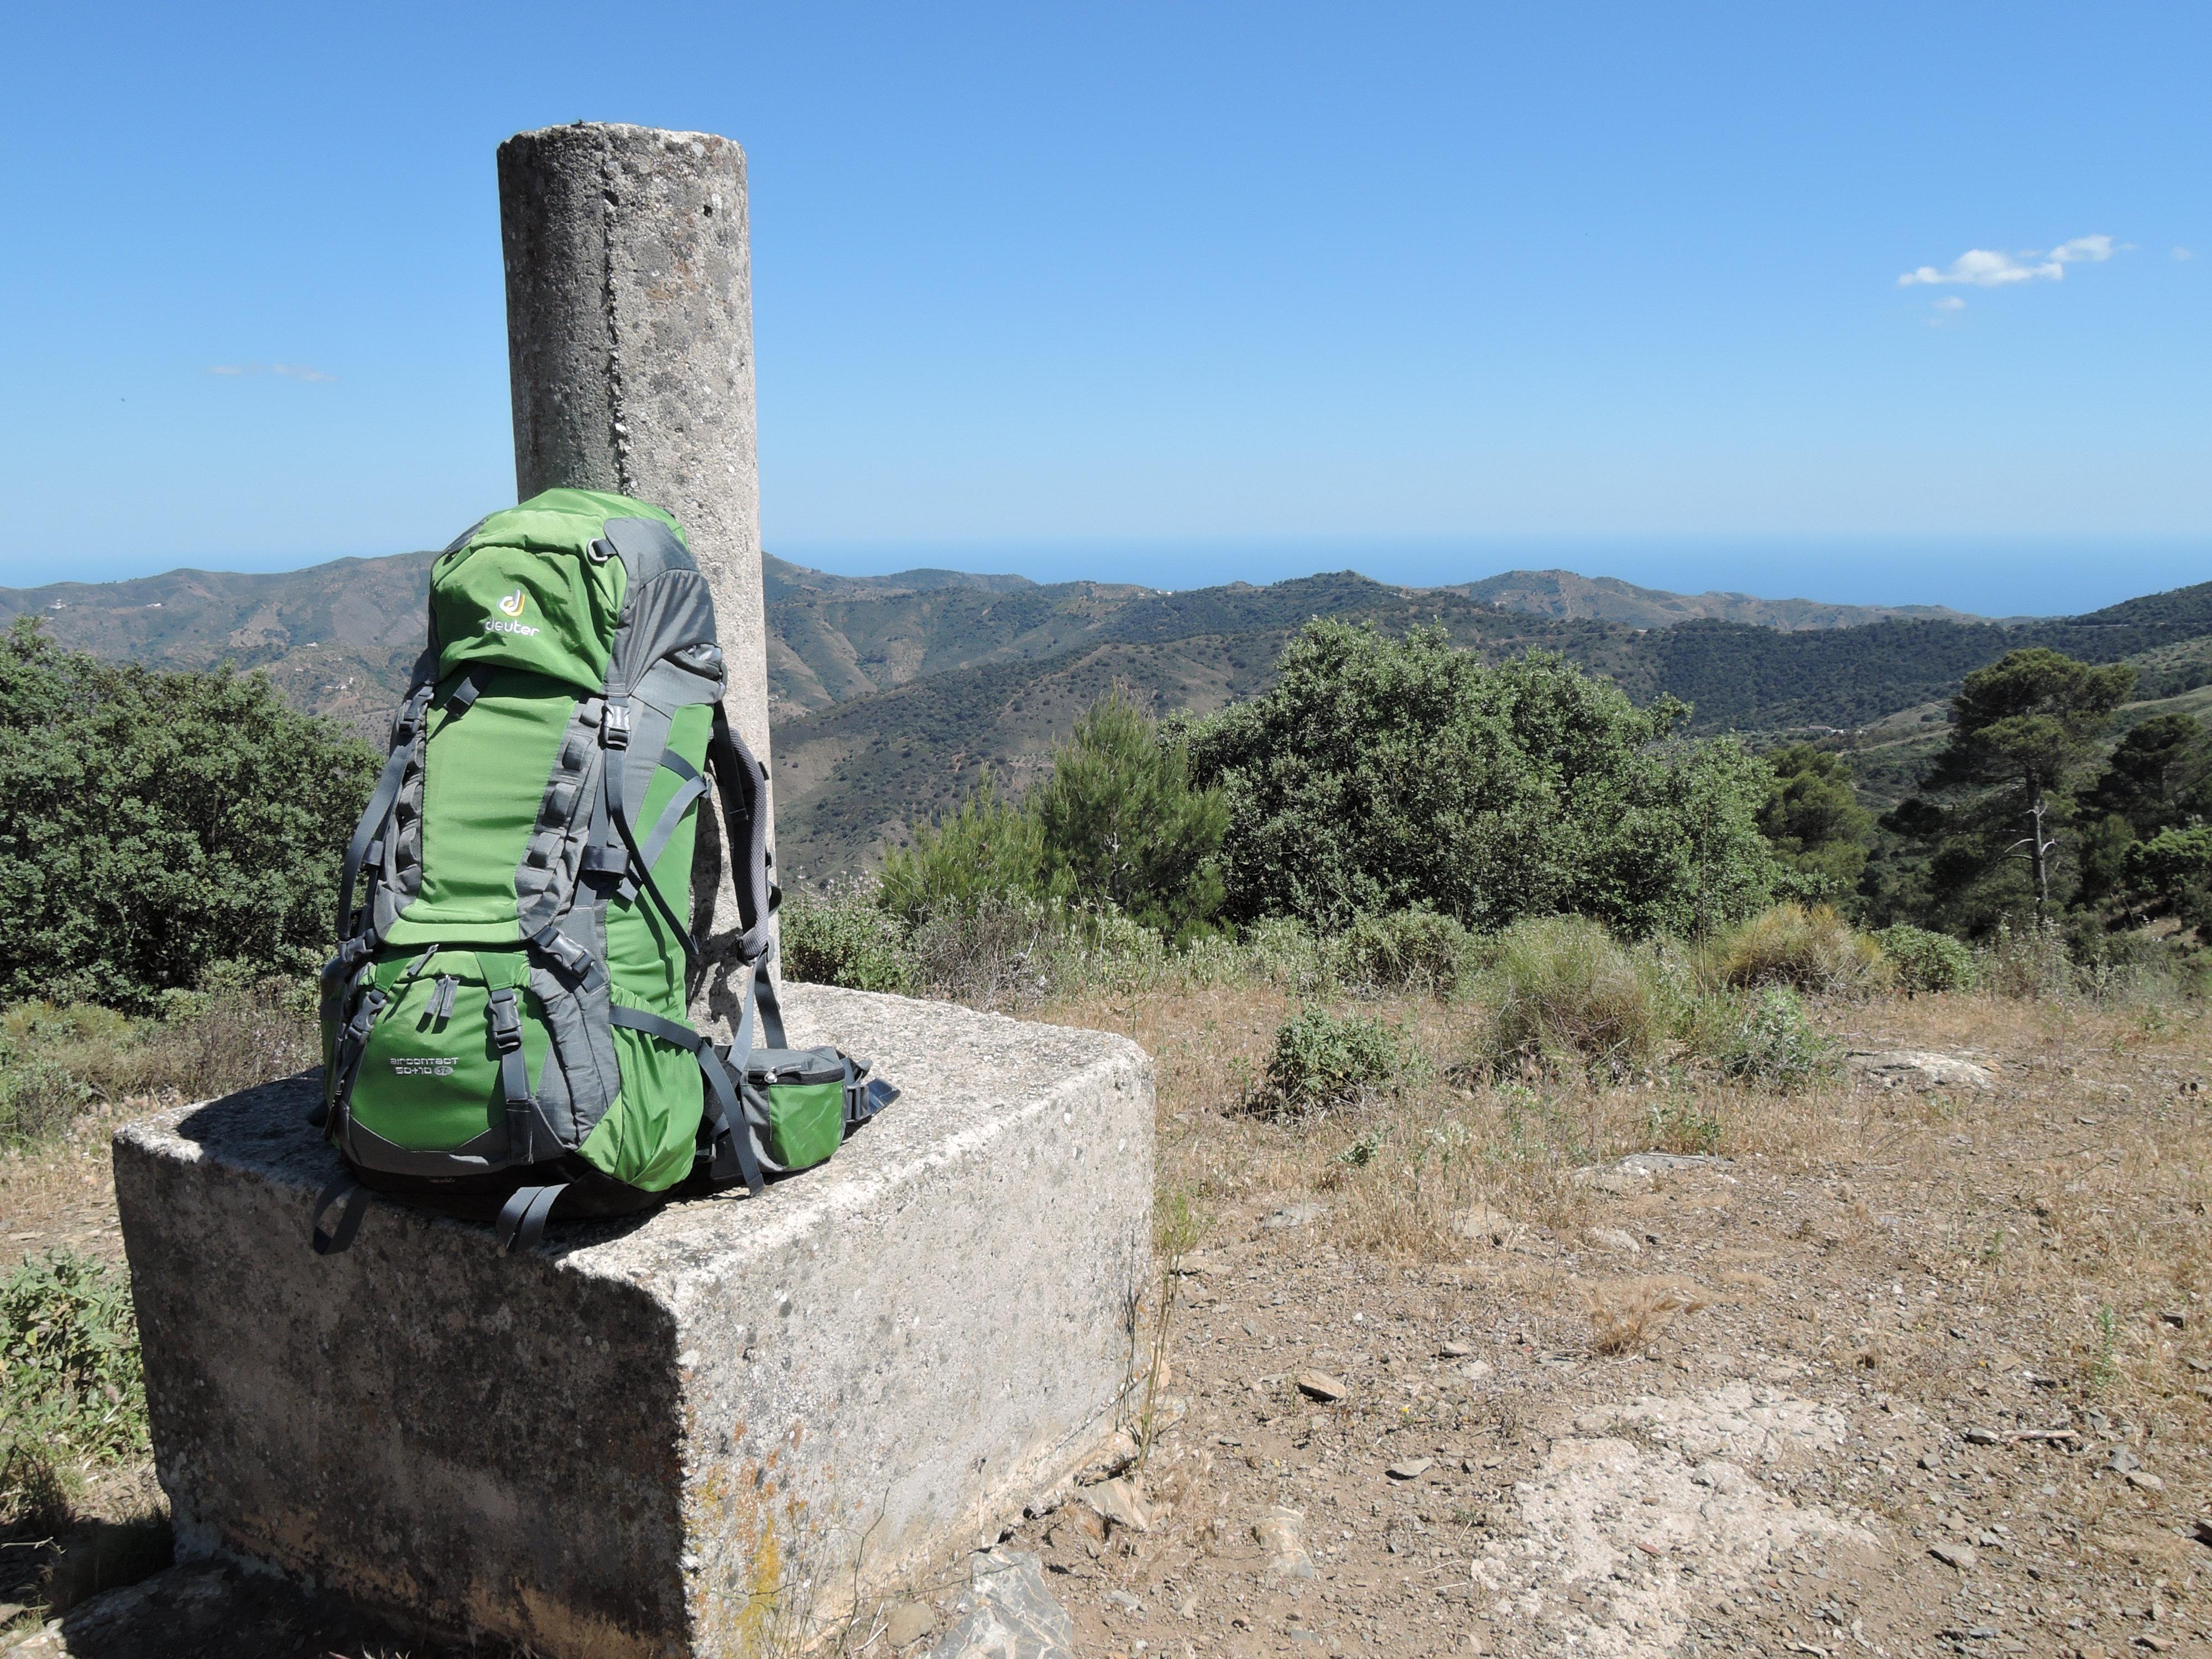 Montes des Malaga - 1029 Meter